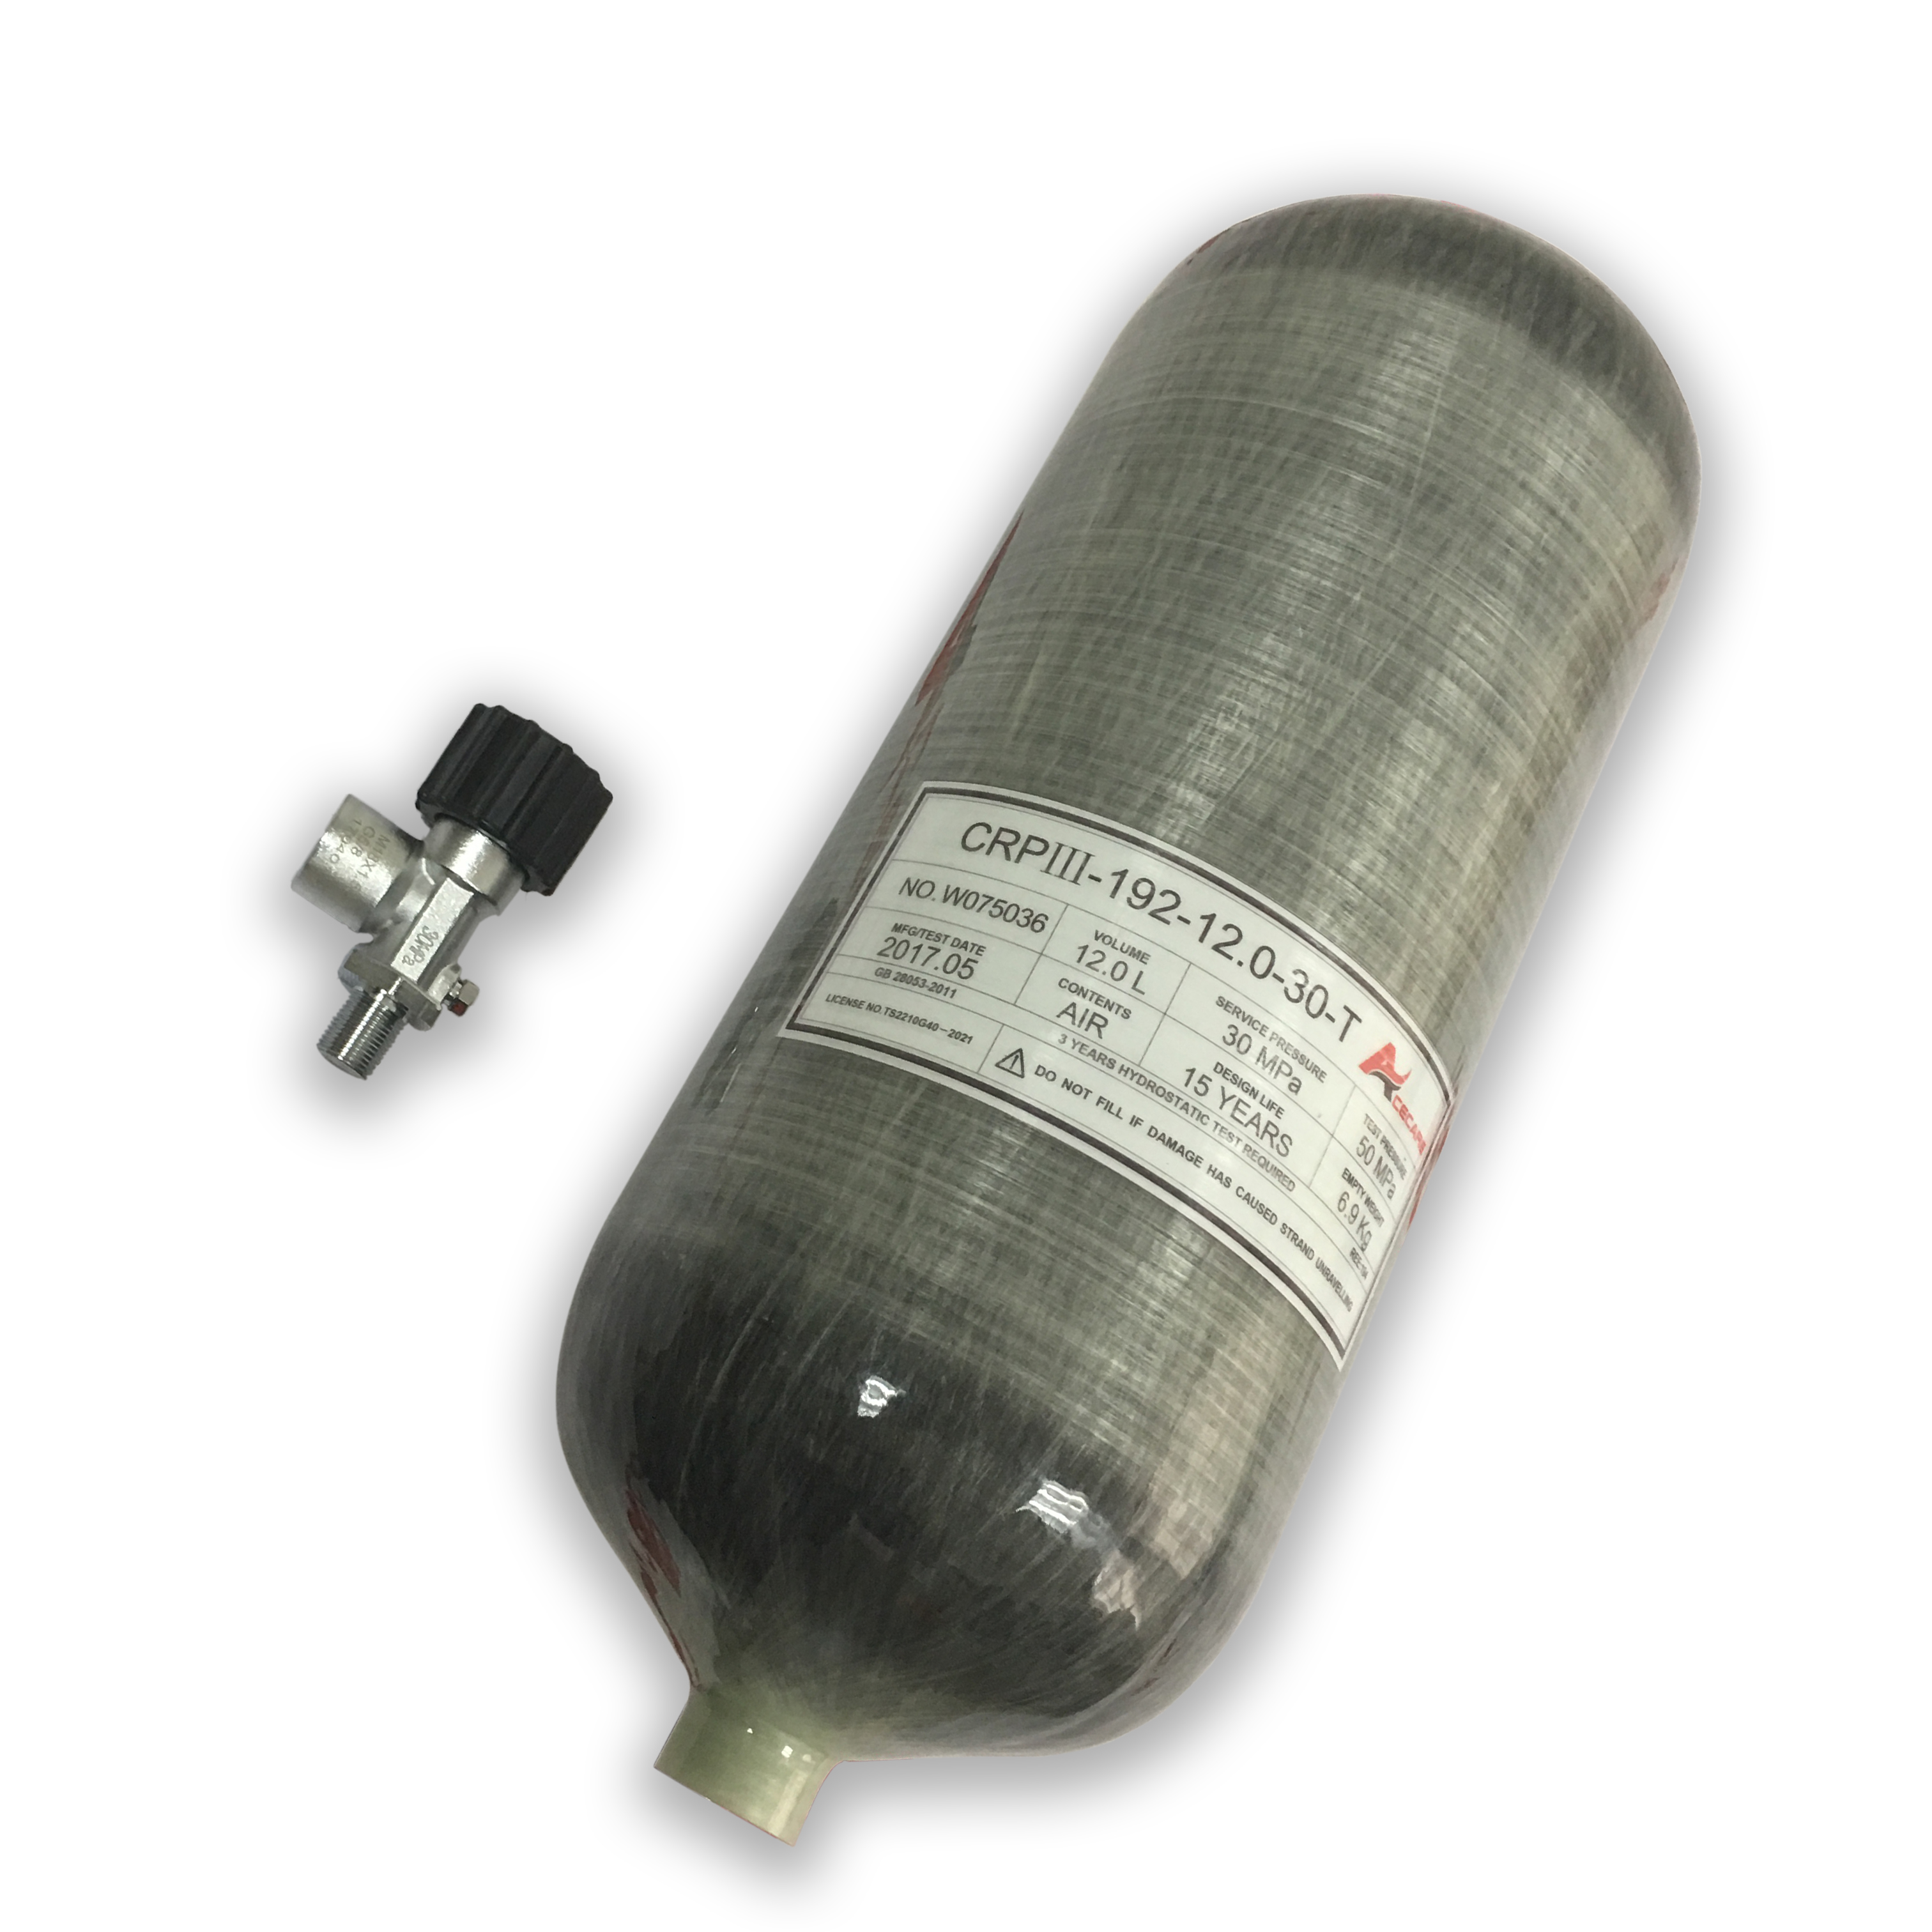 AC31210 Pcp Tank Scuba Mini Diving High Pressure Cylinder 4500psi Airforce Pcp Diving Balloon For Paintball Air Gun ACECARE 2019